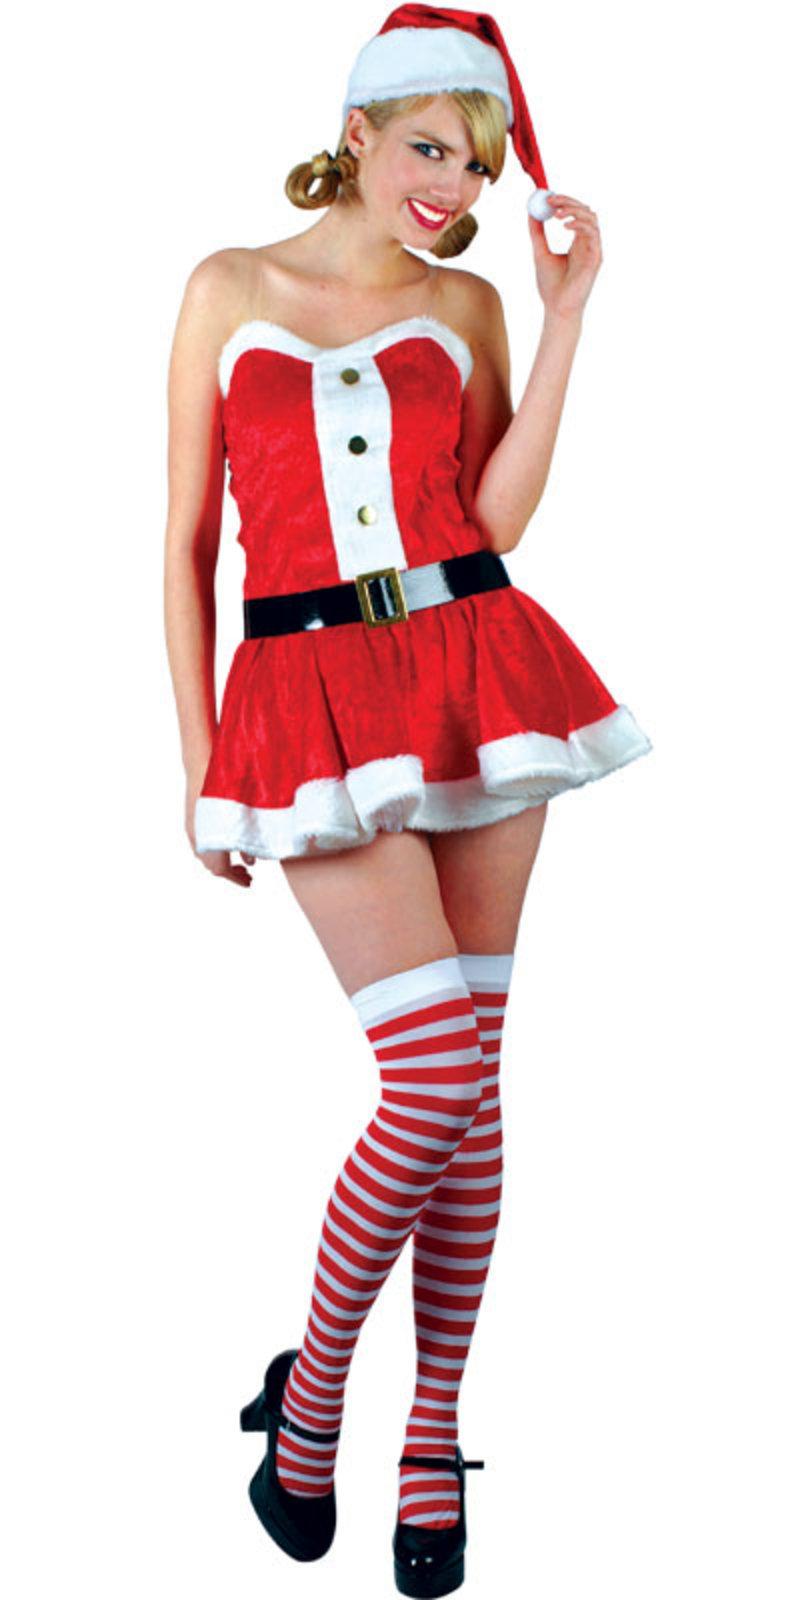 Wkdxm Sexy Santa Girl Ladies Christmas Fancy Dress Costume